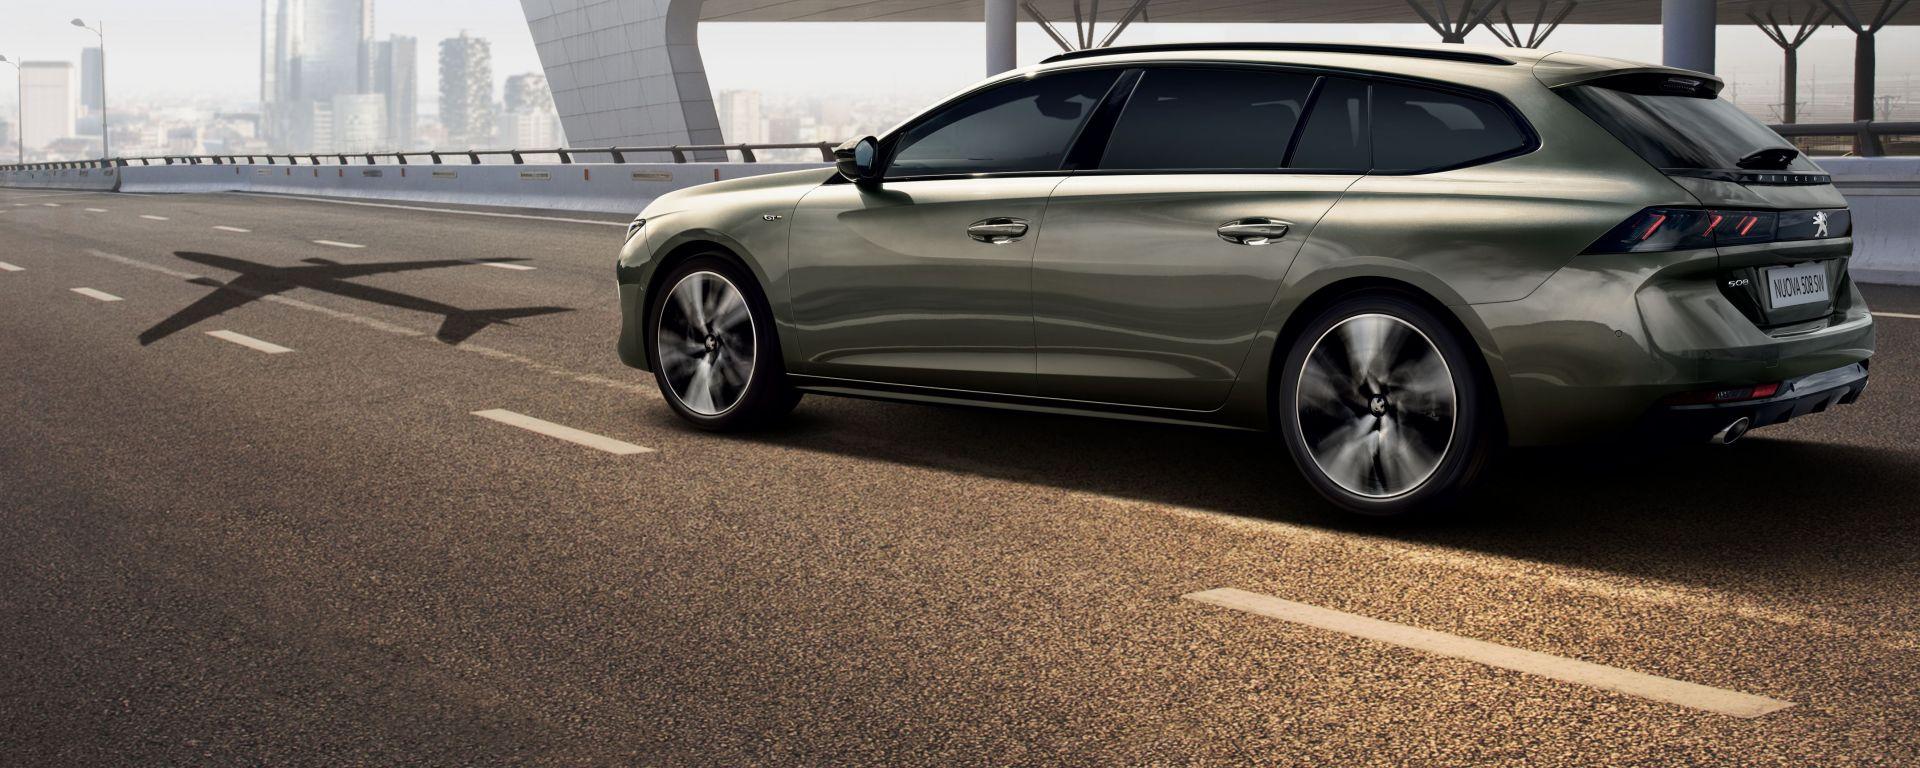 Nuova Peugeot 508 SW 2019